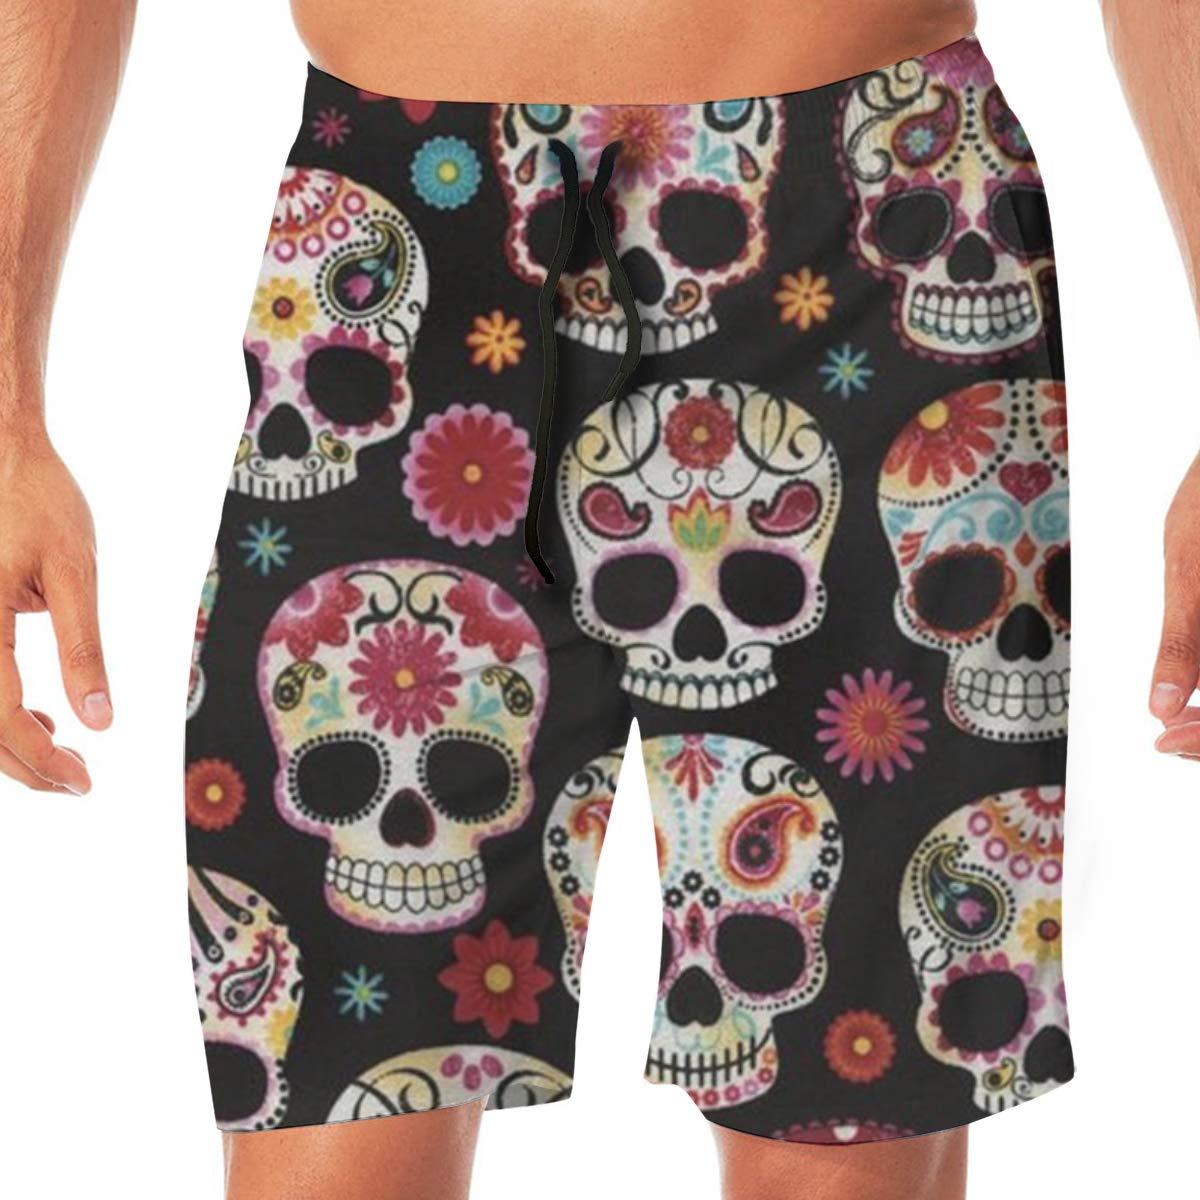 TR2YU7YT Novelty Sugar Skull Casual Mens Swim Trunks Quick Dry Printed Beach Shorts Summer Boardshorts Bathing Suits with Drawstring